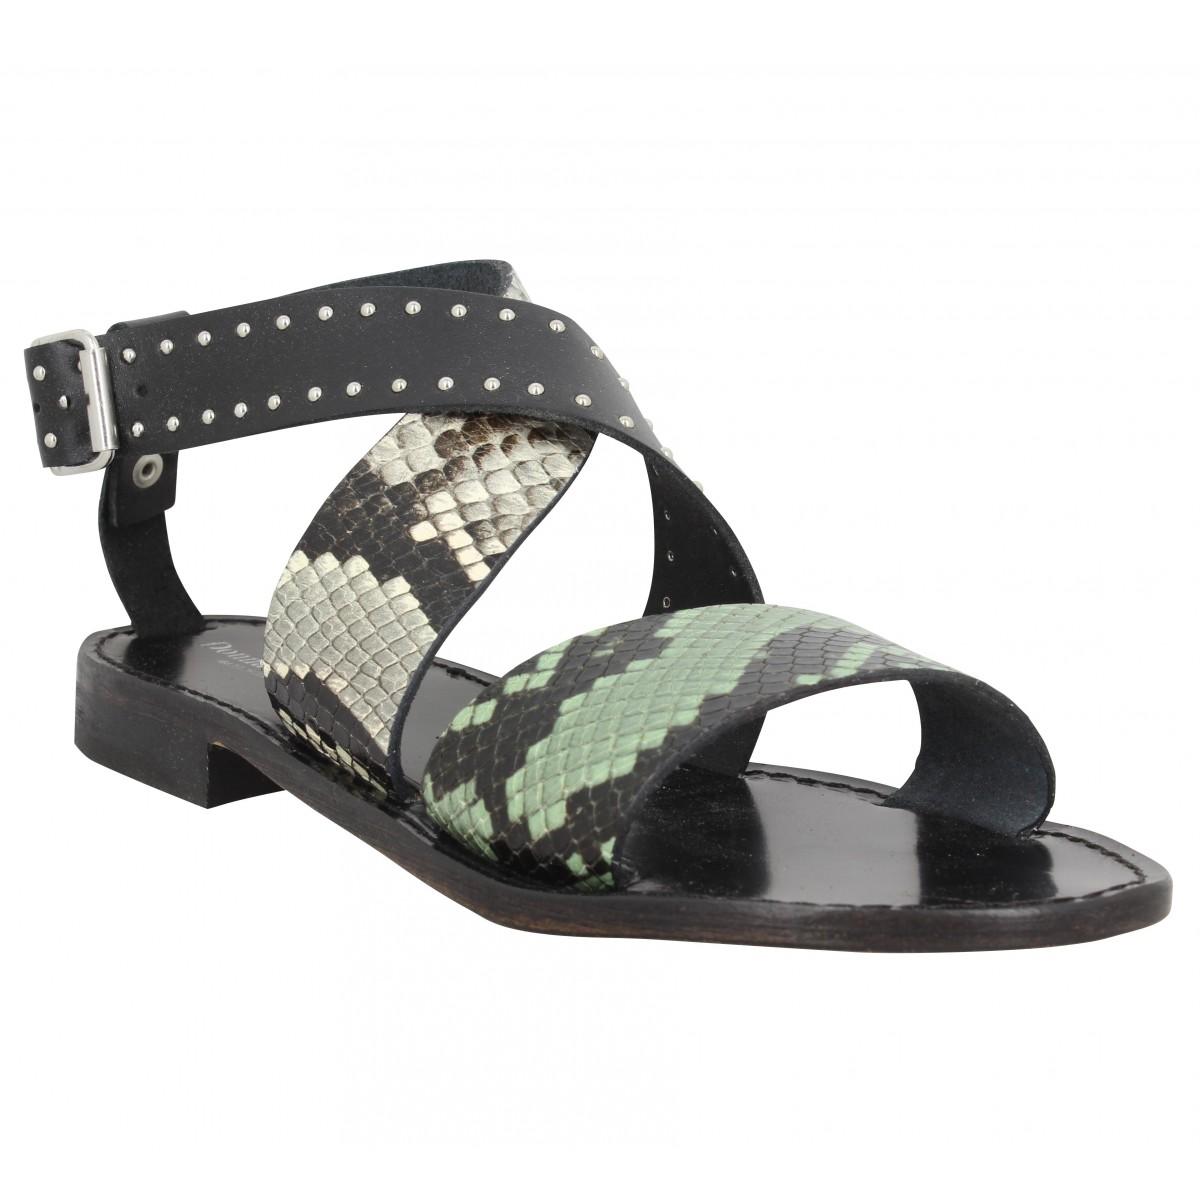 Nu-pieds DONNA LUCCA 1153 reptile Femme Noir